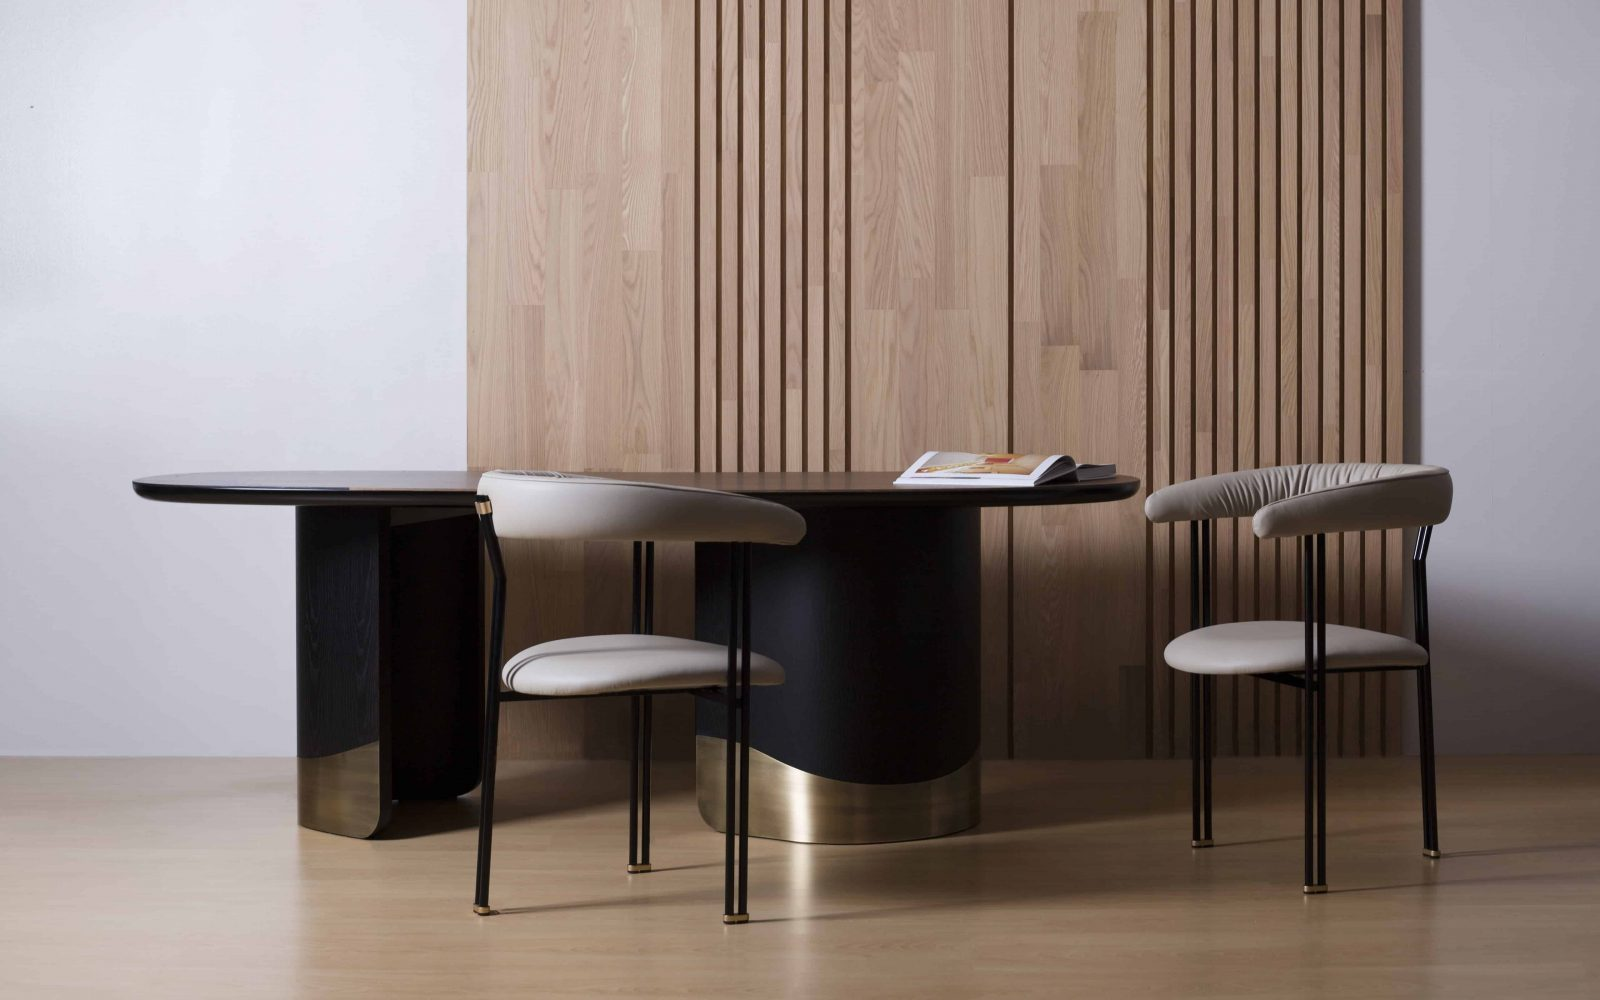 Armona-G703132-Table-11